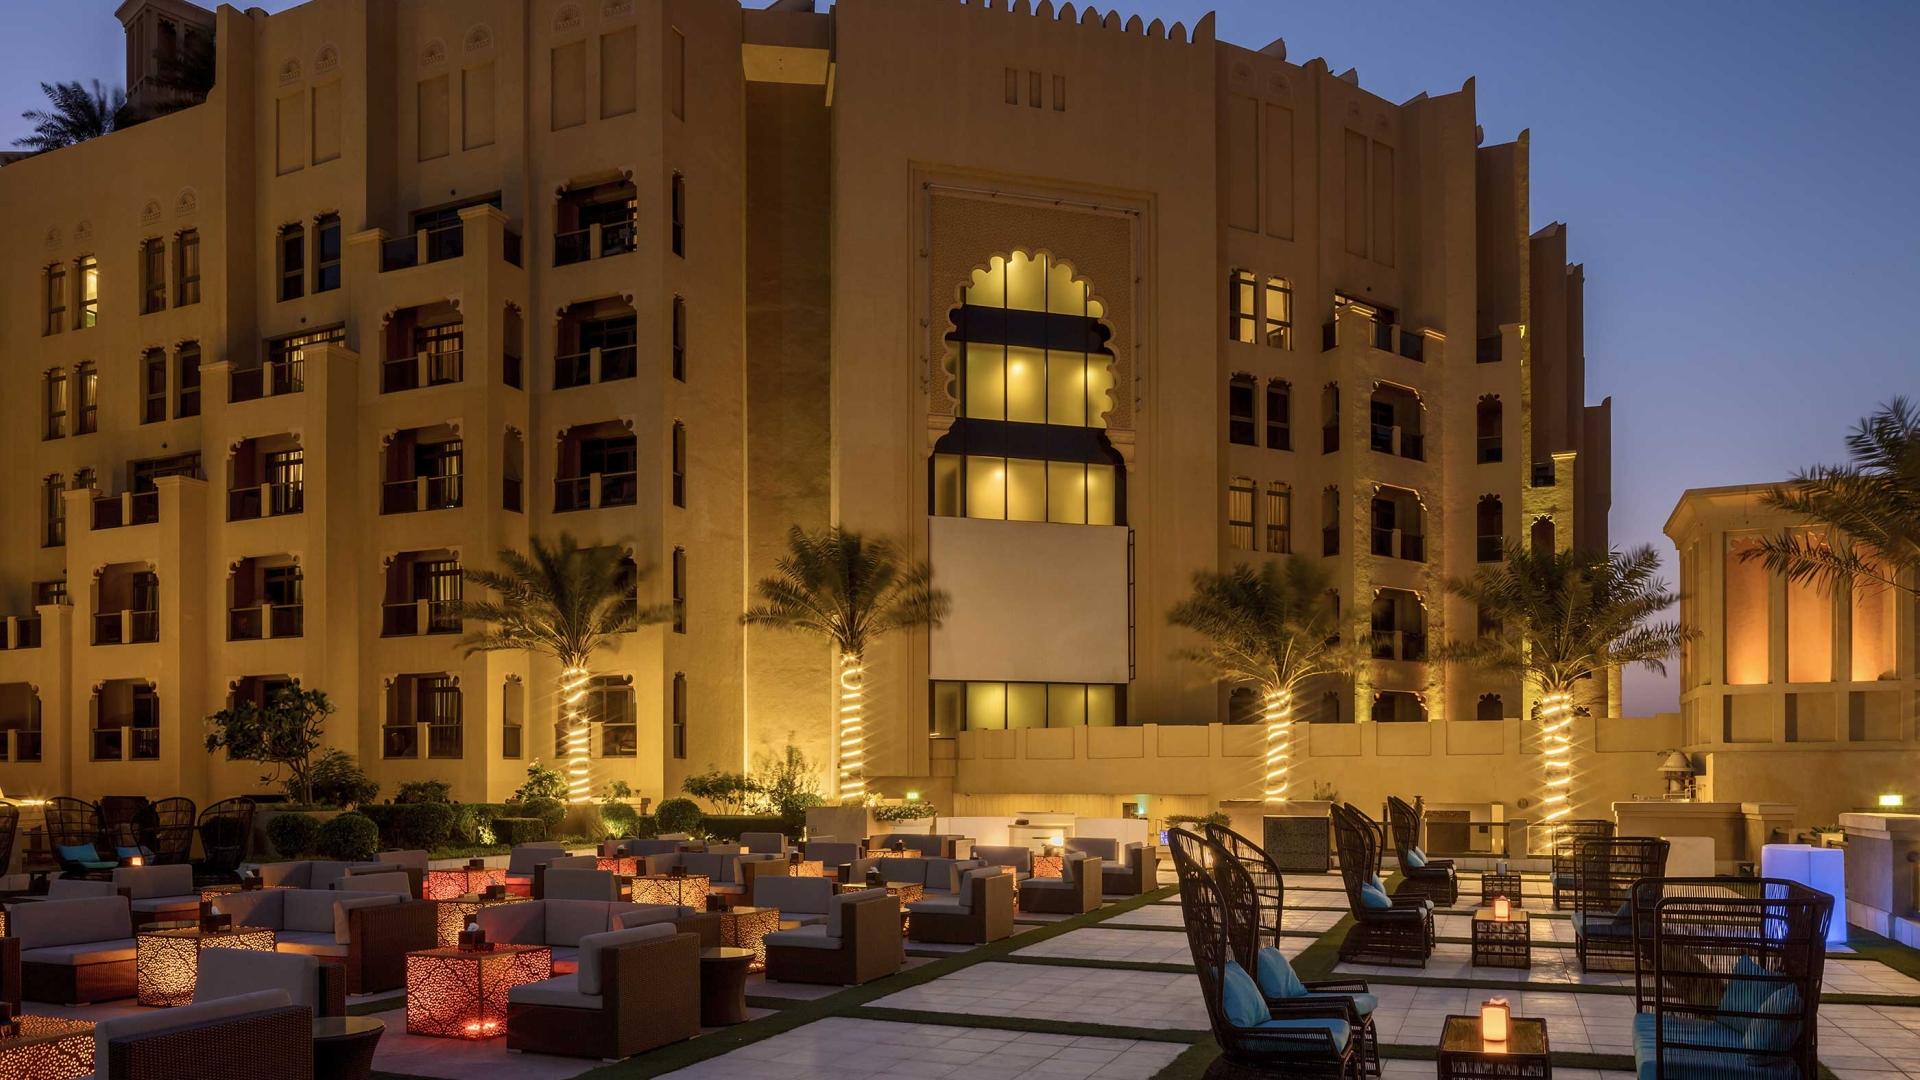 Bahi Ajman Palace Hotel Relaxtion Yard